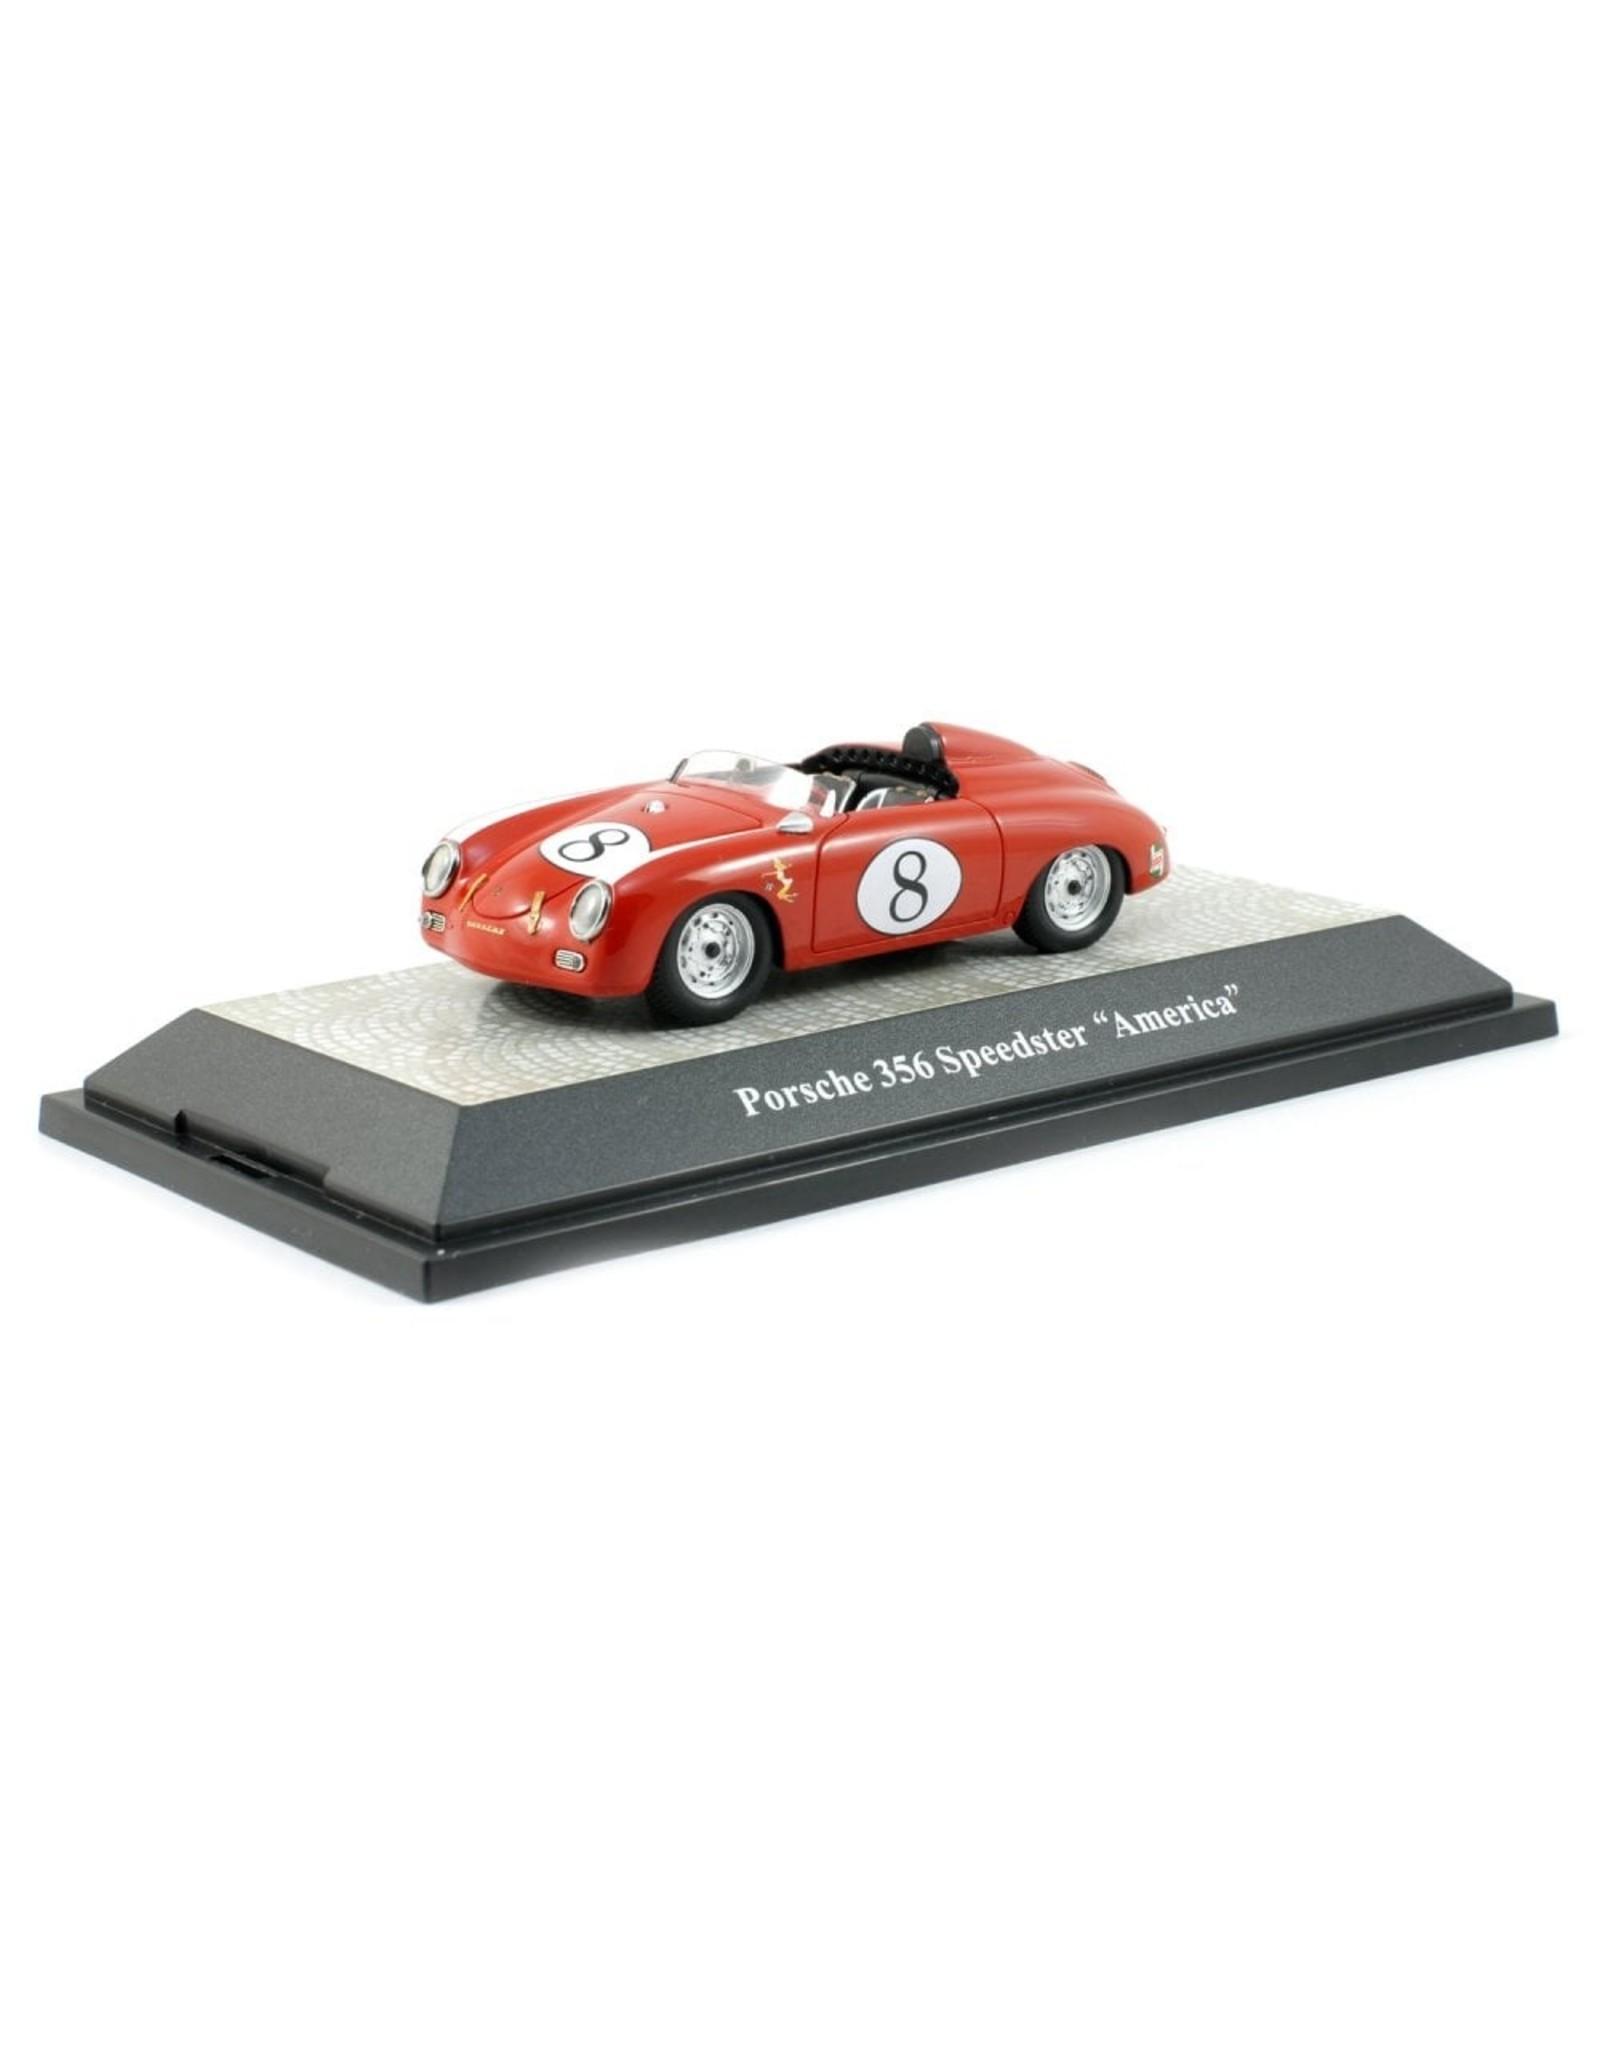 Porsche Porsche 356 Speedster America #8 - 1:43 - Premium ClassiXXs